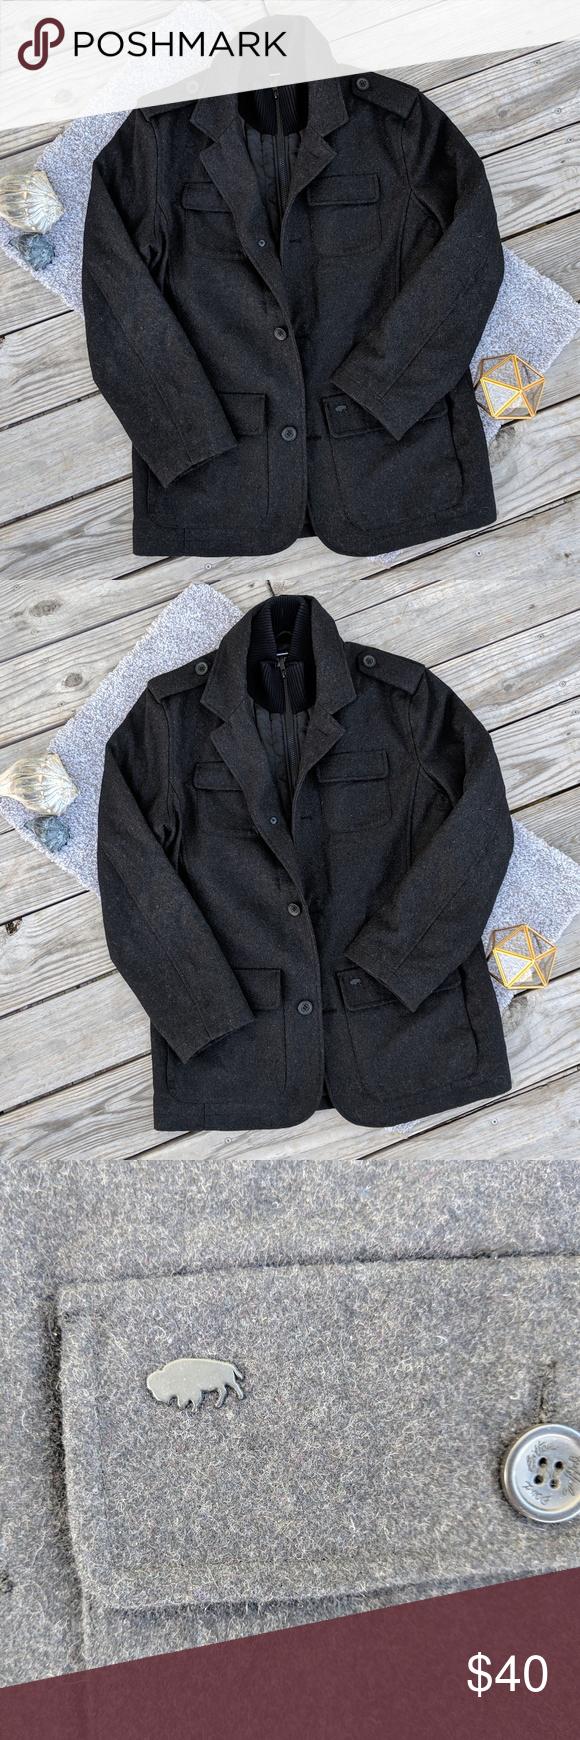 David Bitton Buffalo Outerwear Lined Coat M Outerwear Coat Lined [ 1740 x 580 Pixel ]